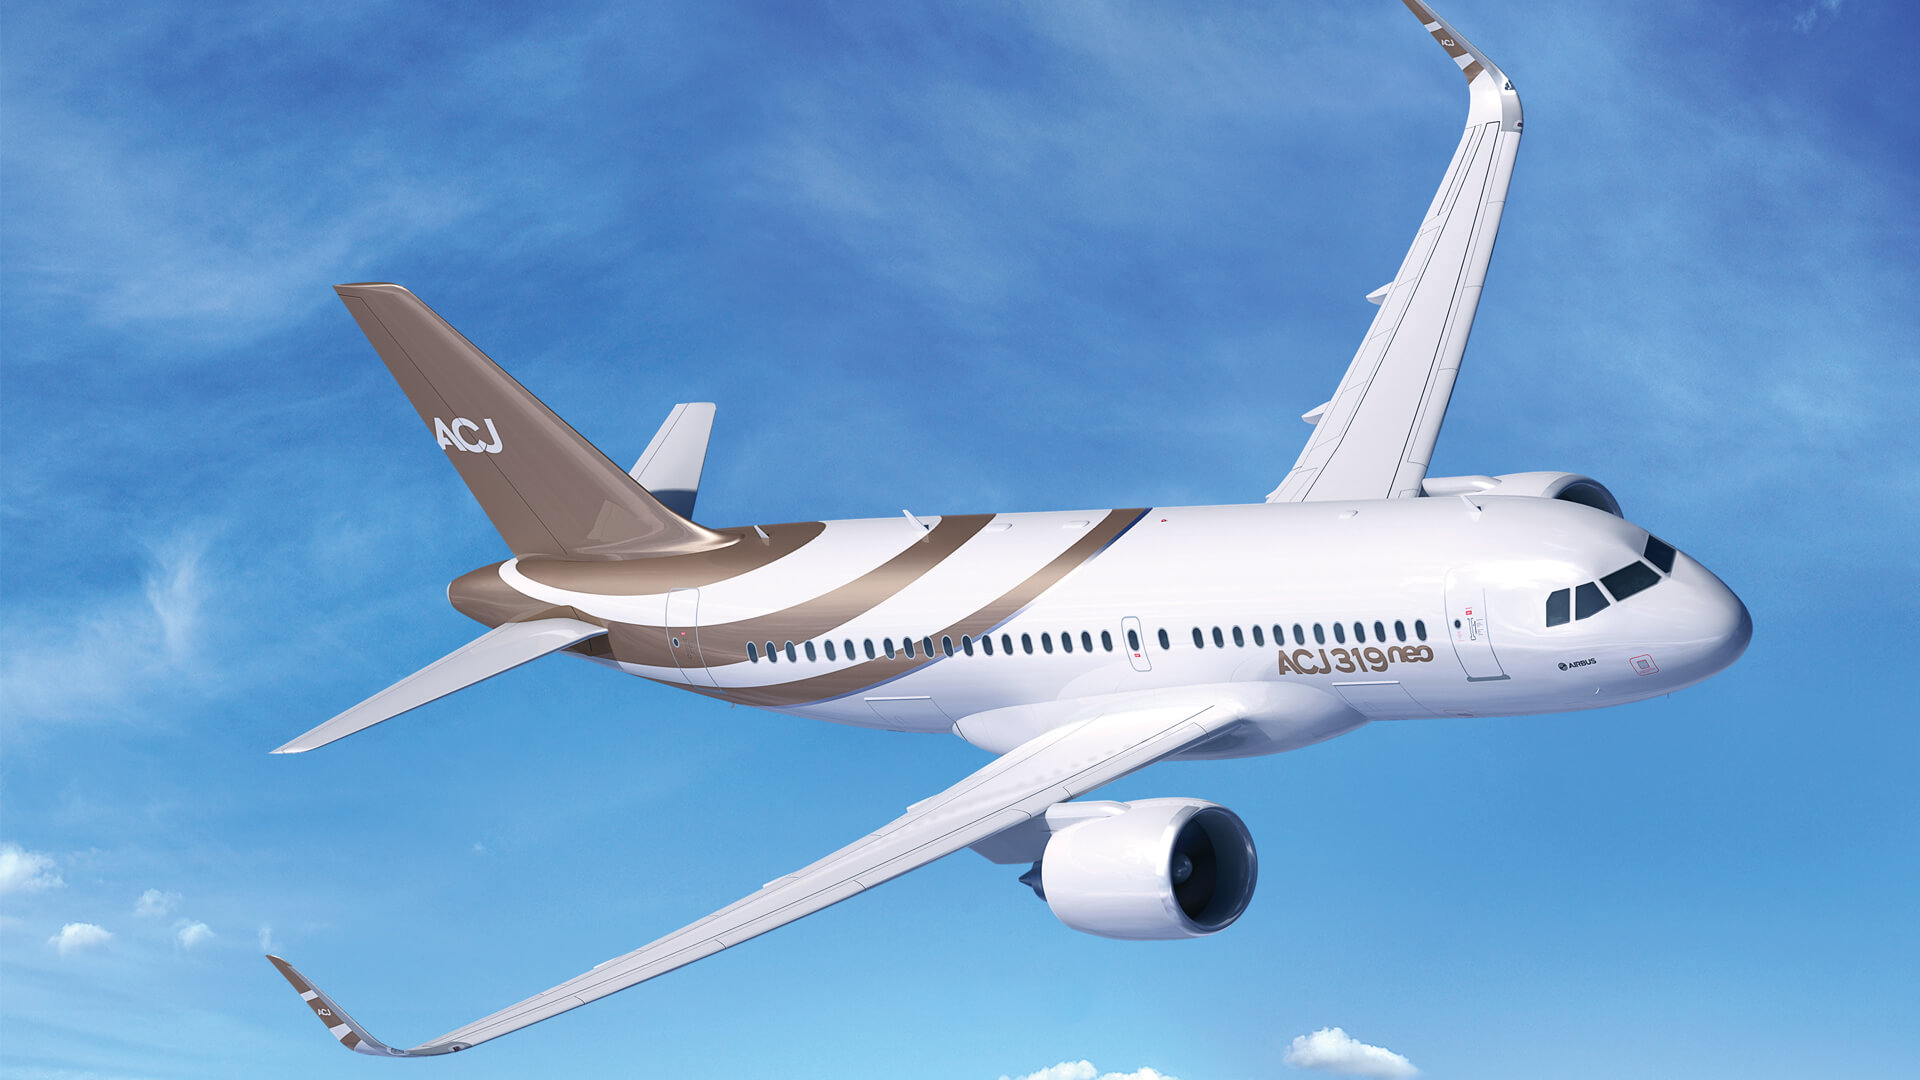 https://www.aerojetme.com/wp-content/uploads/2020/11/airbus-319-corporate-jet.jpg